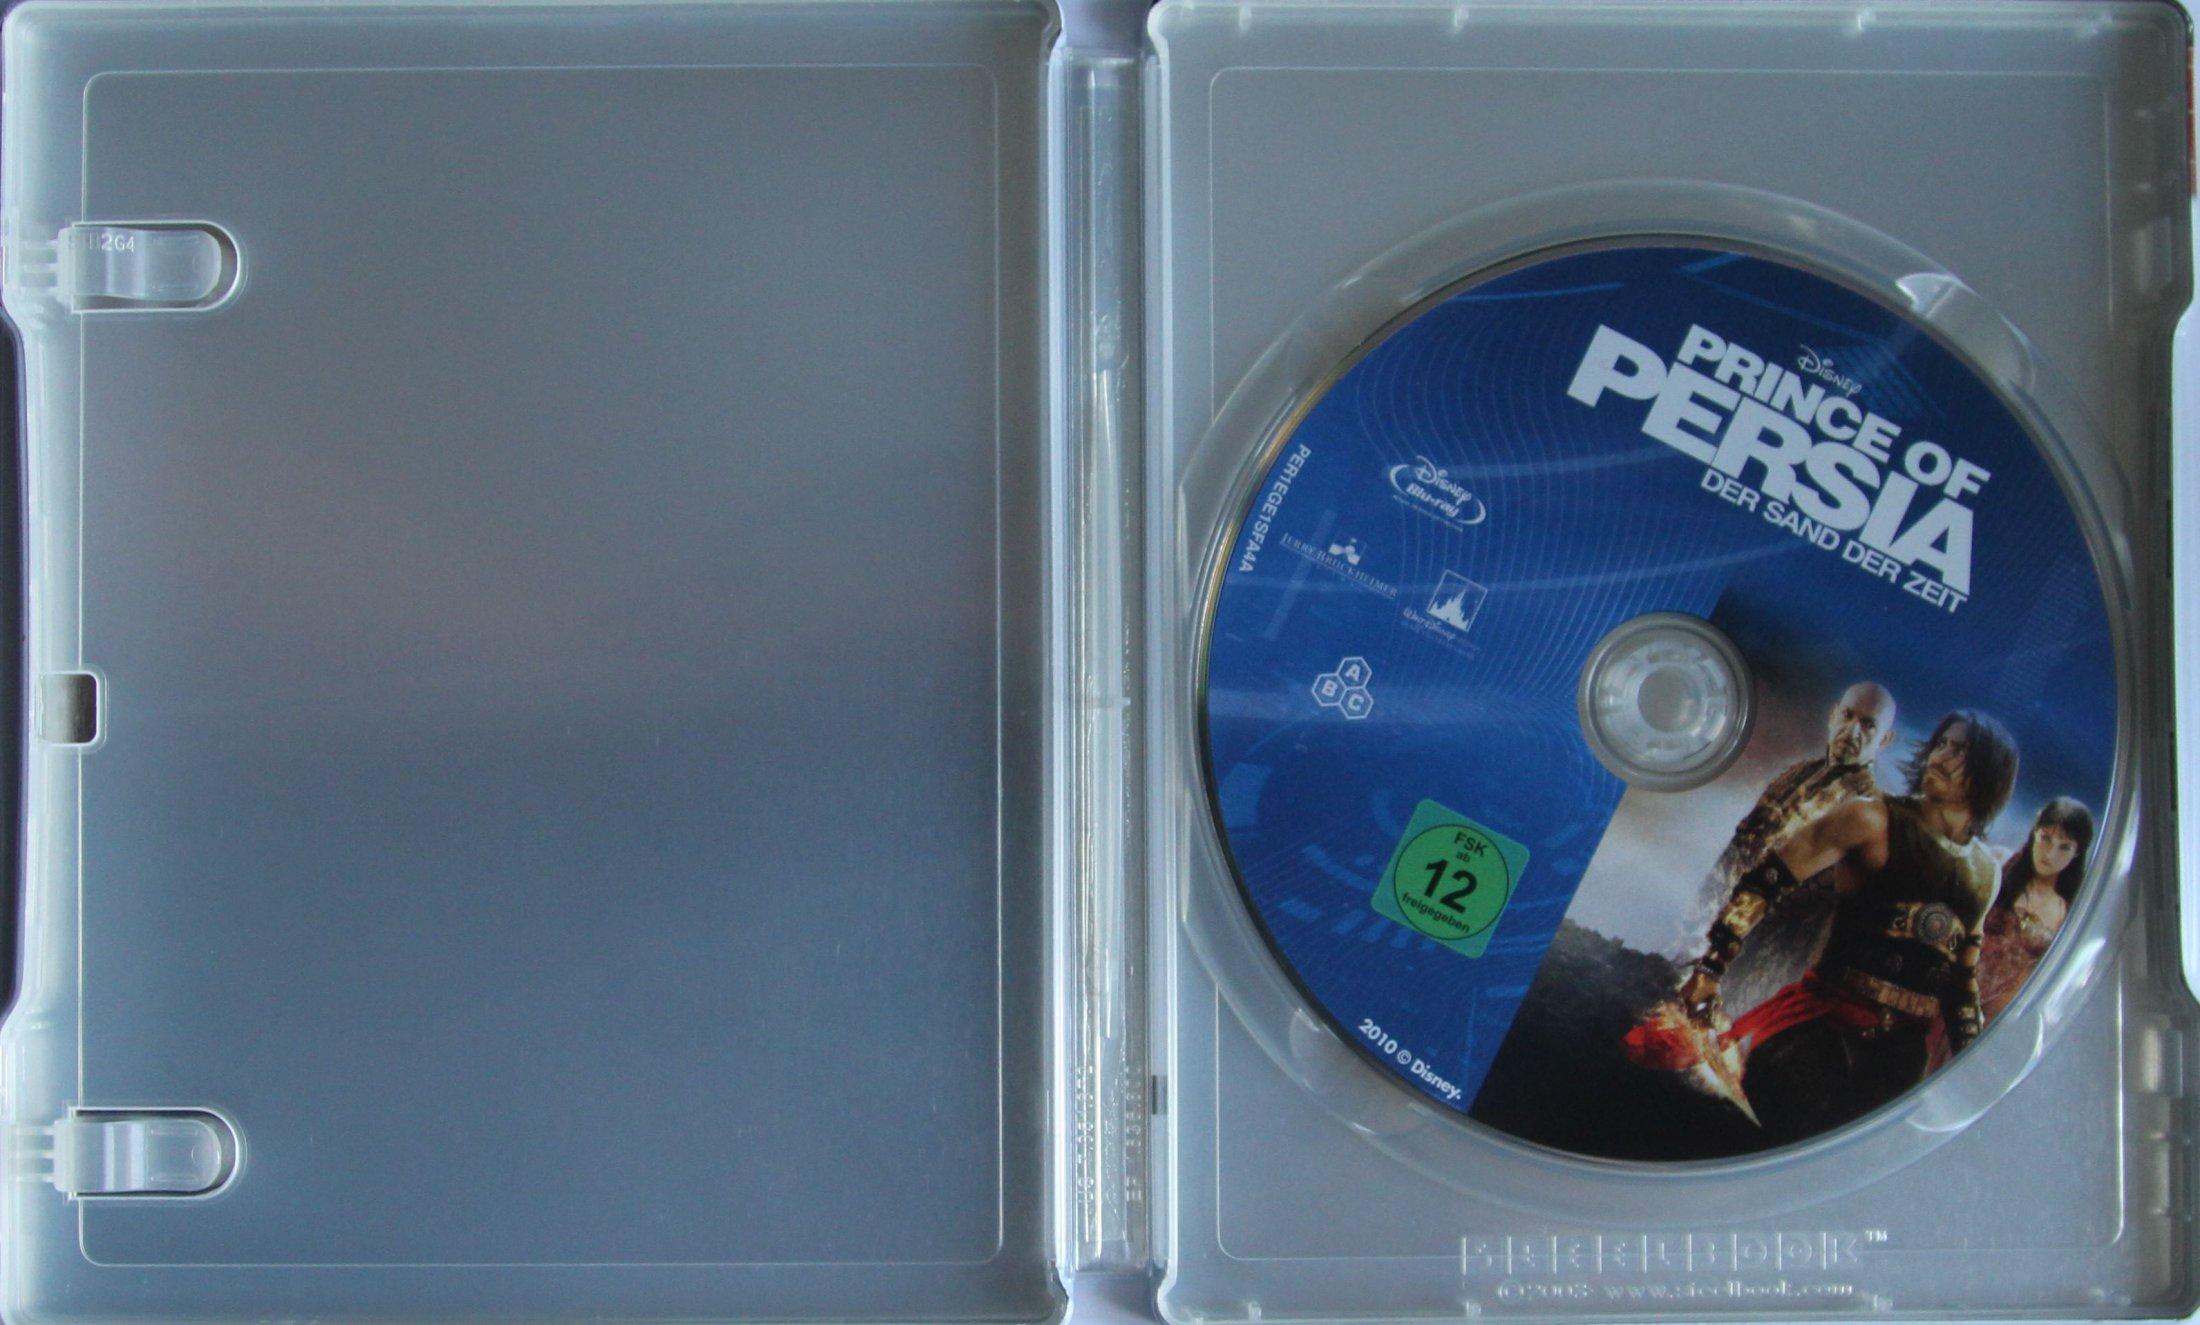 Prince of Persia Steelbook Innen mit disk